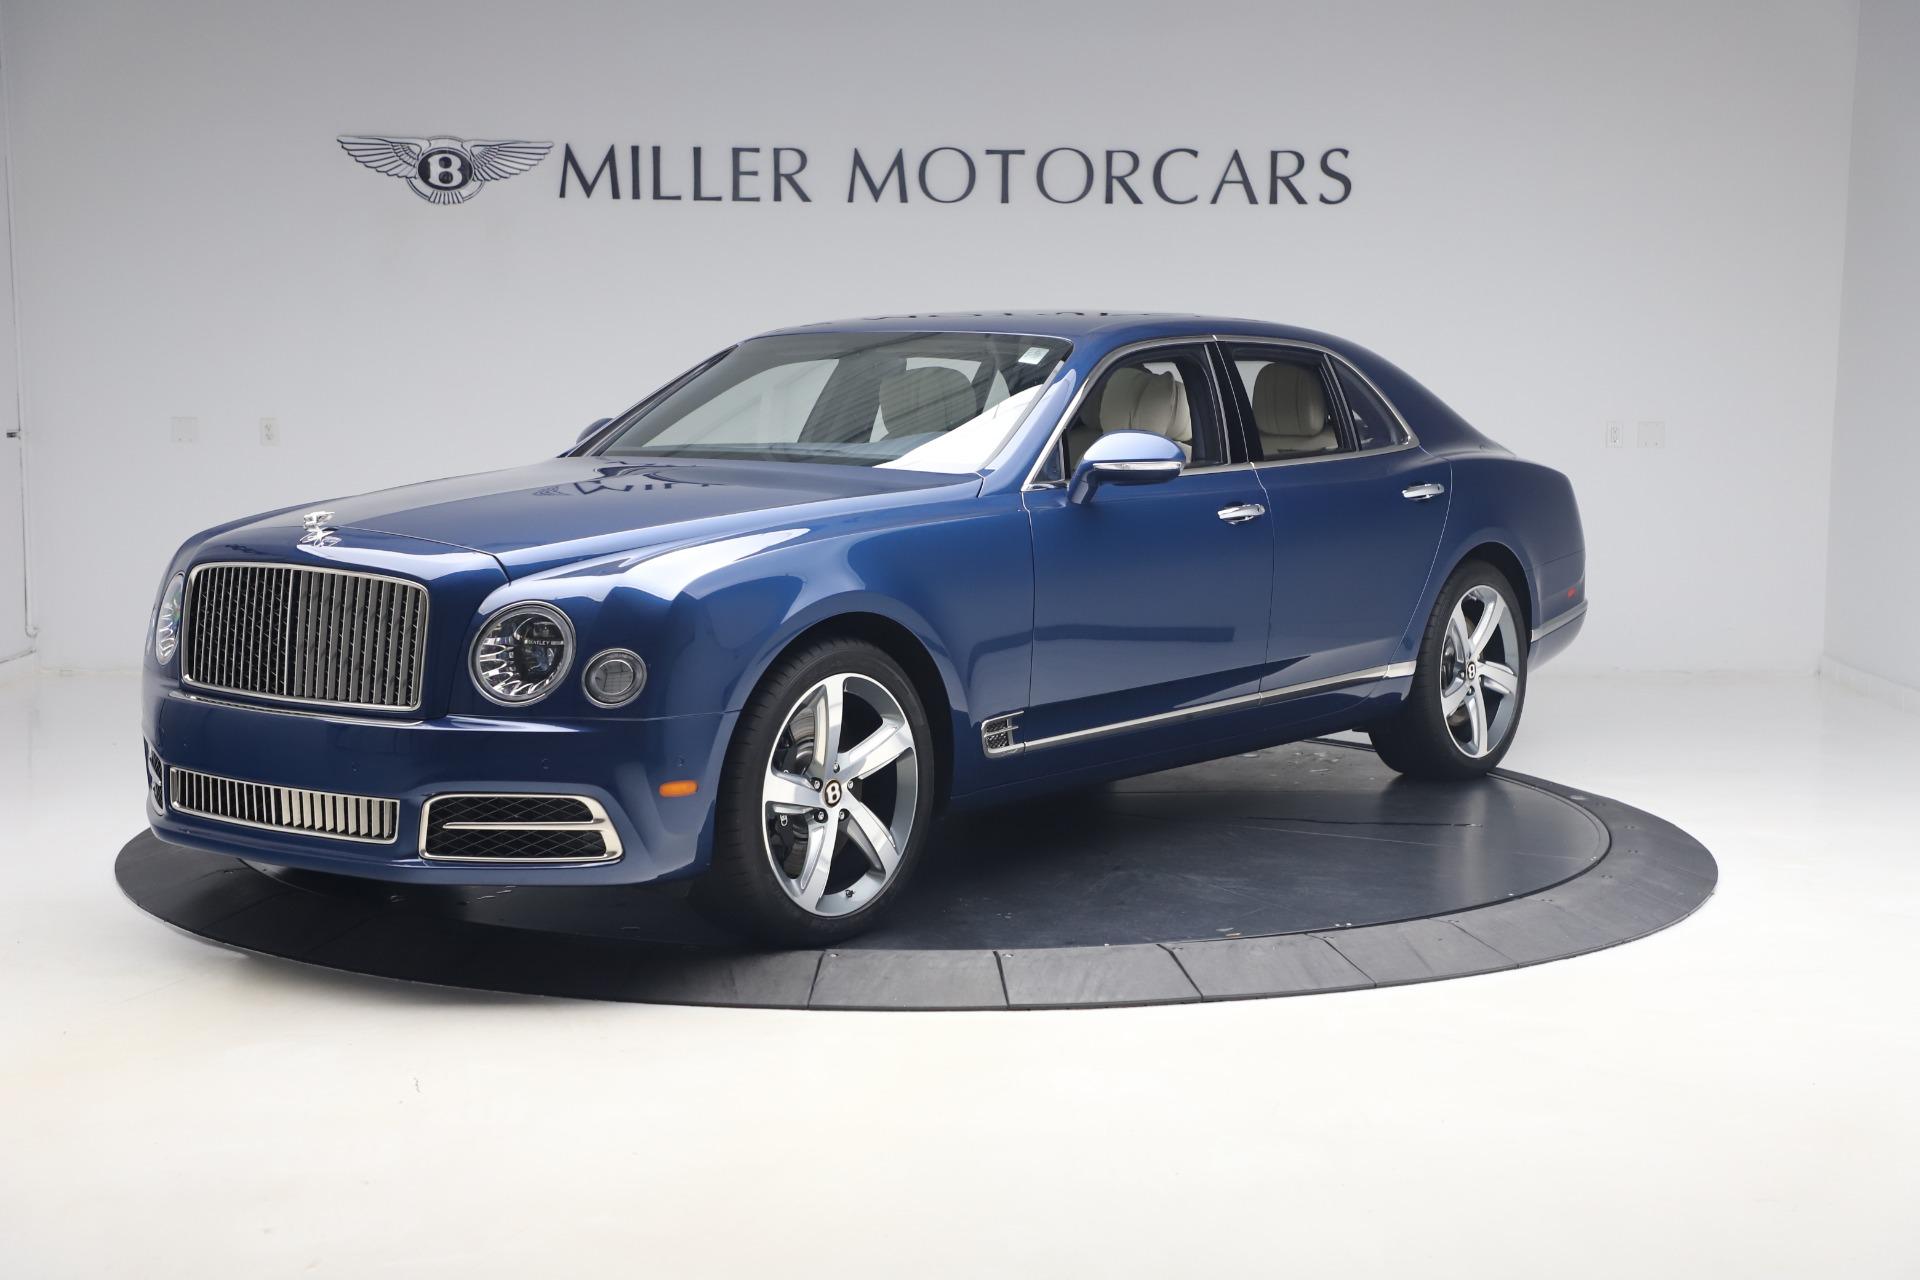 Used 2020 Bentley Mulsanne Speed for sale $269,900 at Maserati of Westport in Westport CT 06880 1